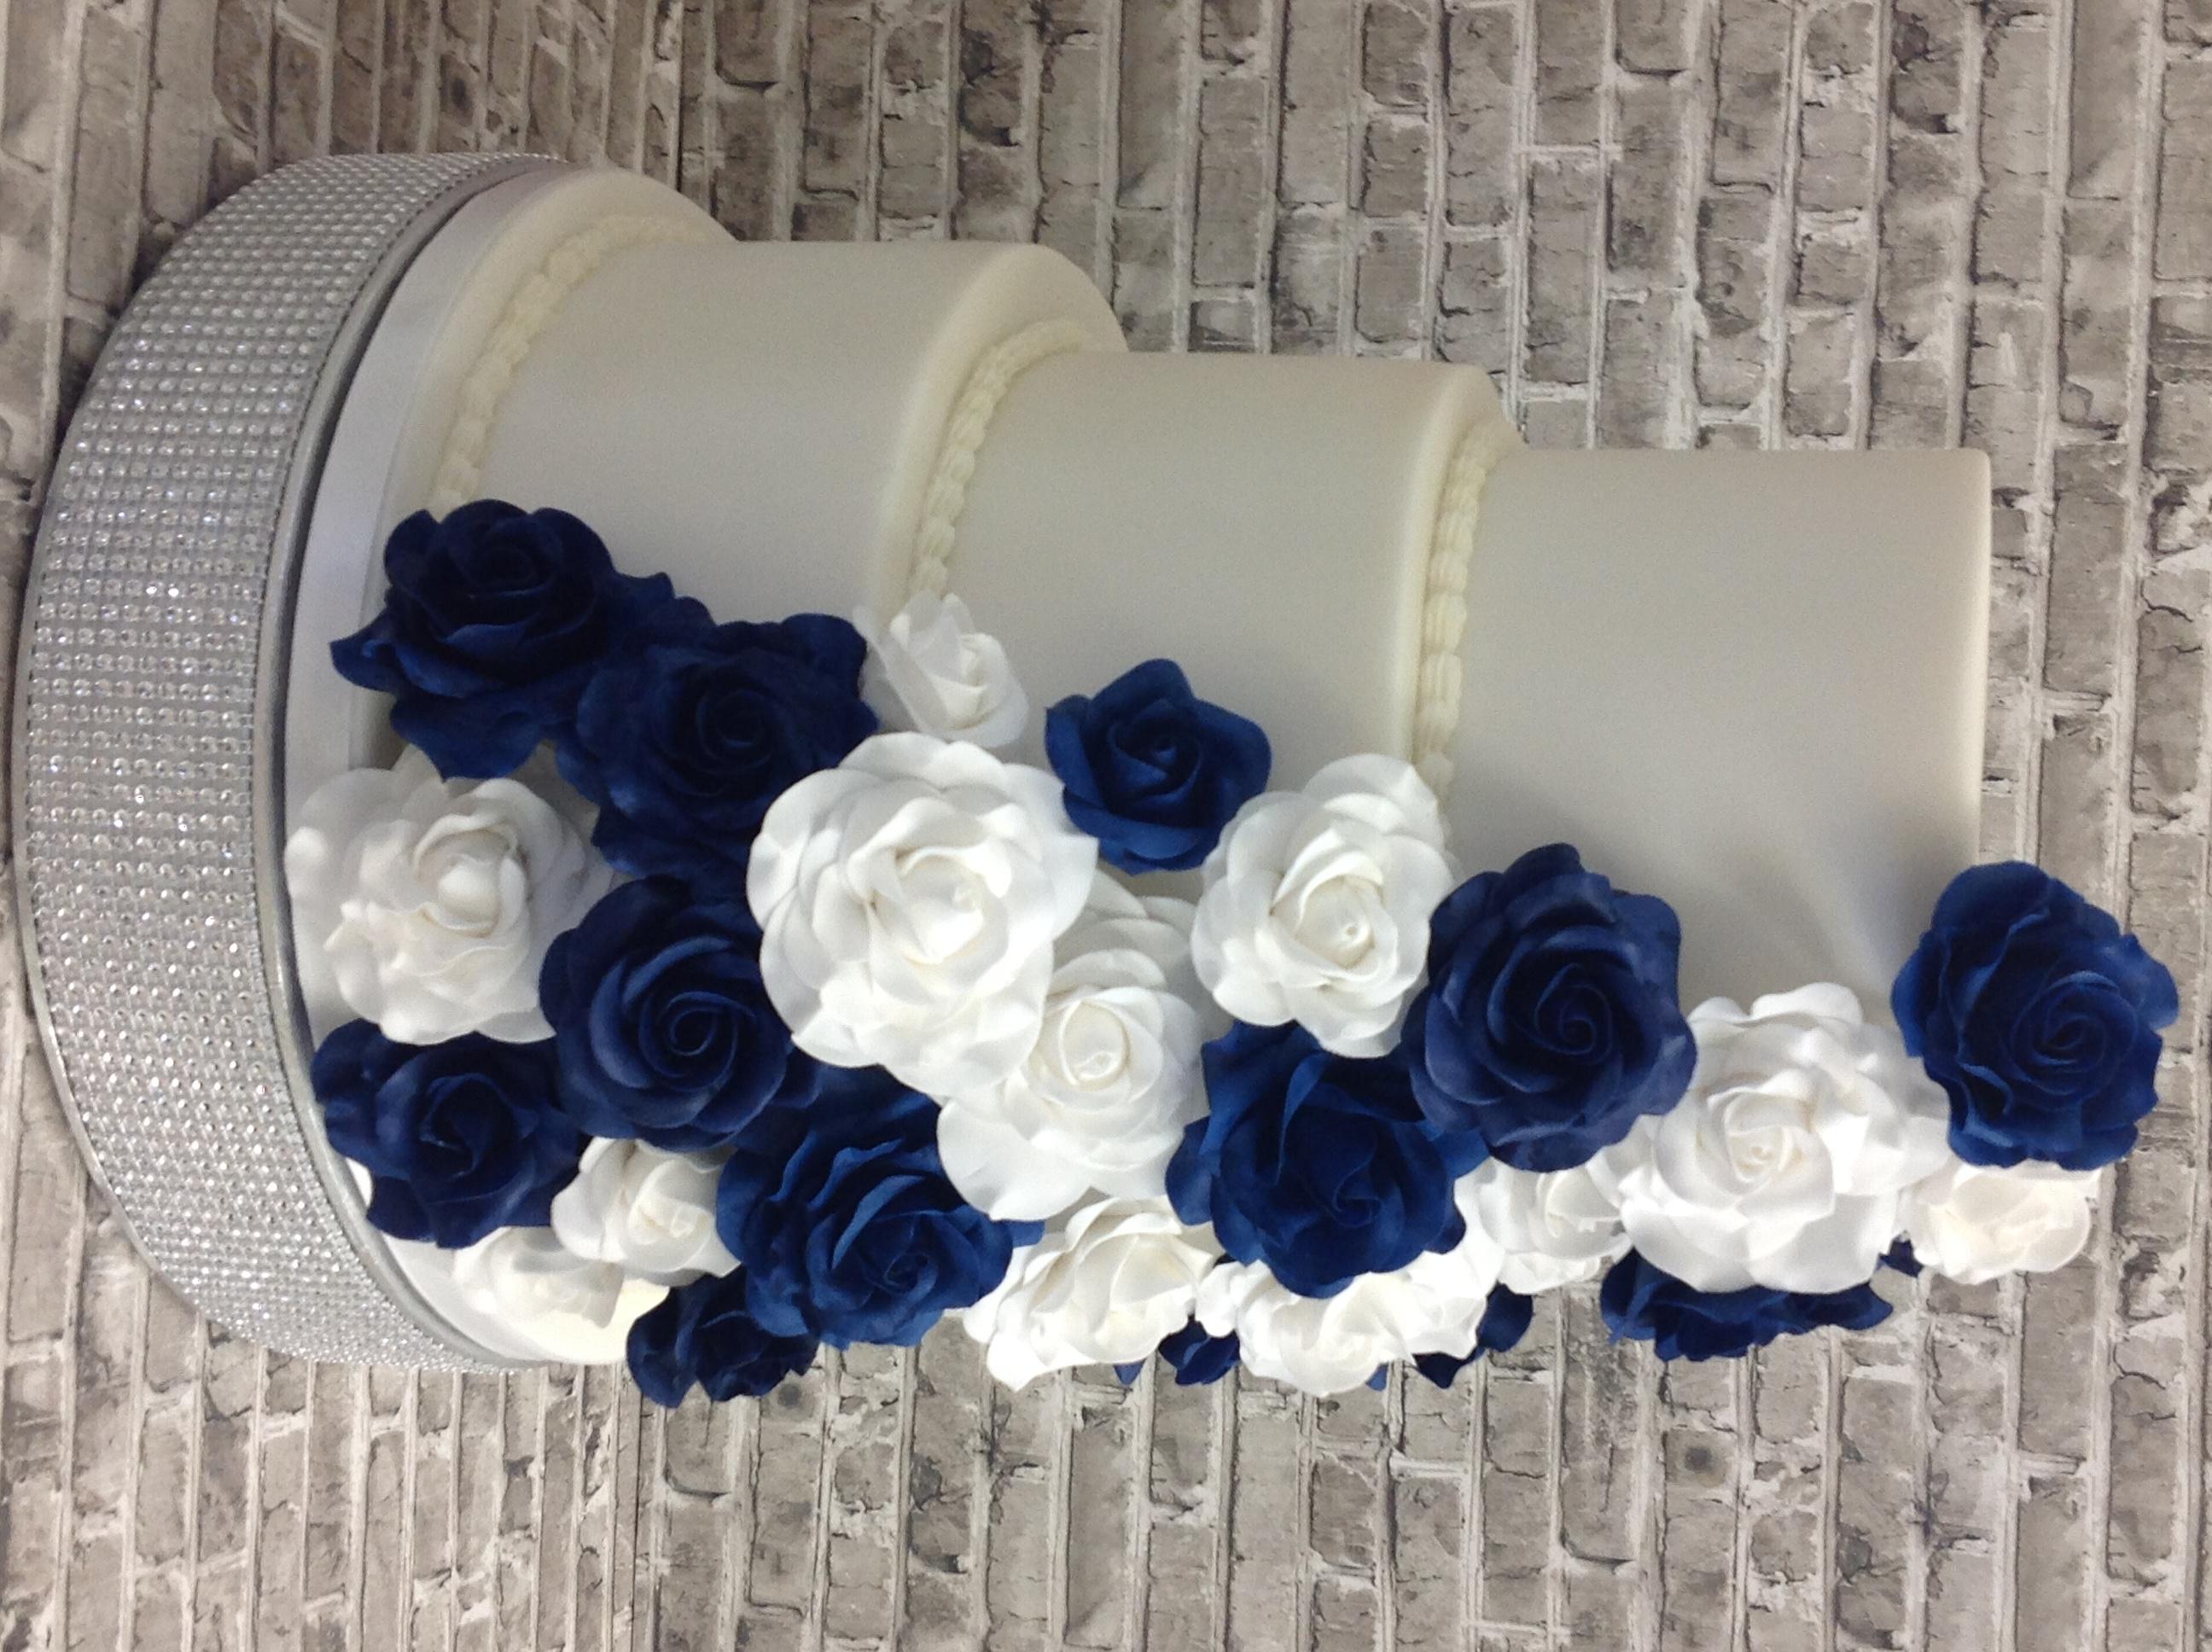 Chloe And Bobby's Wedding cake